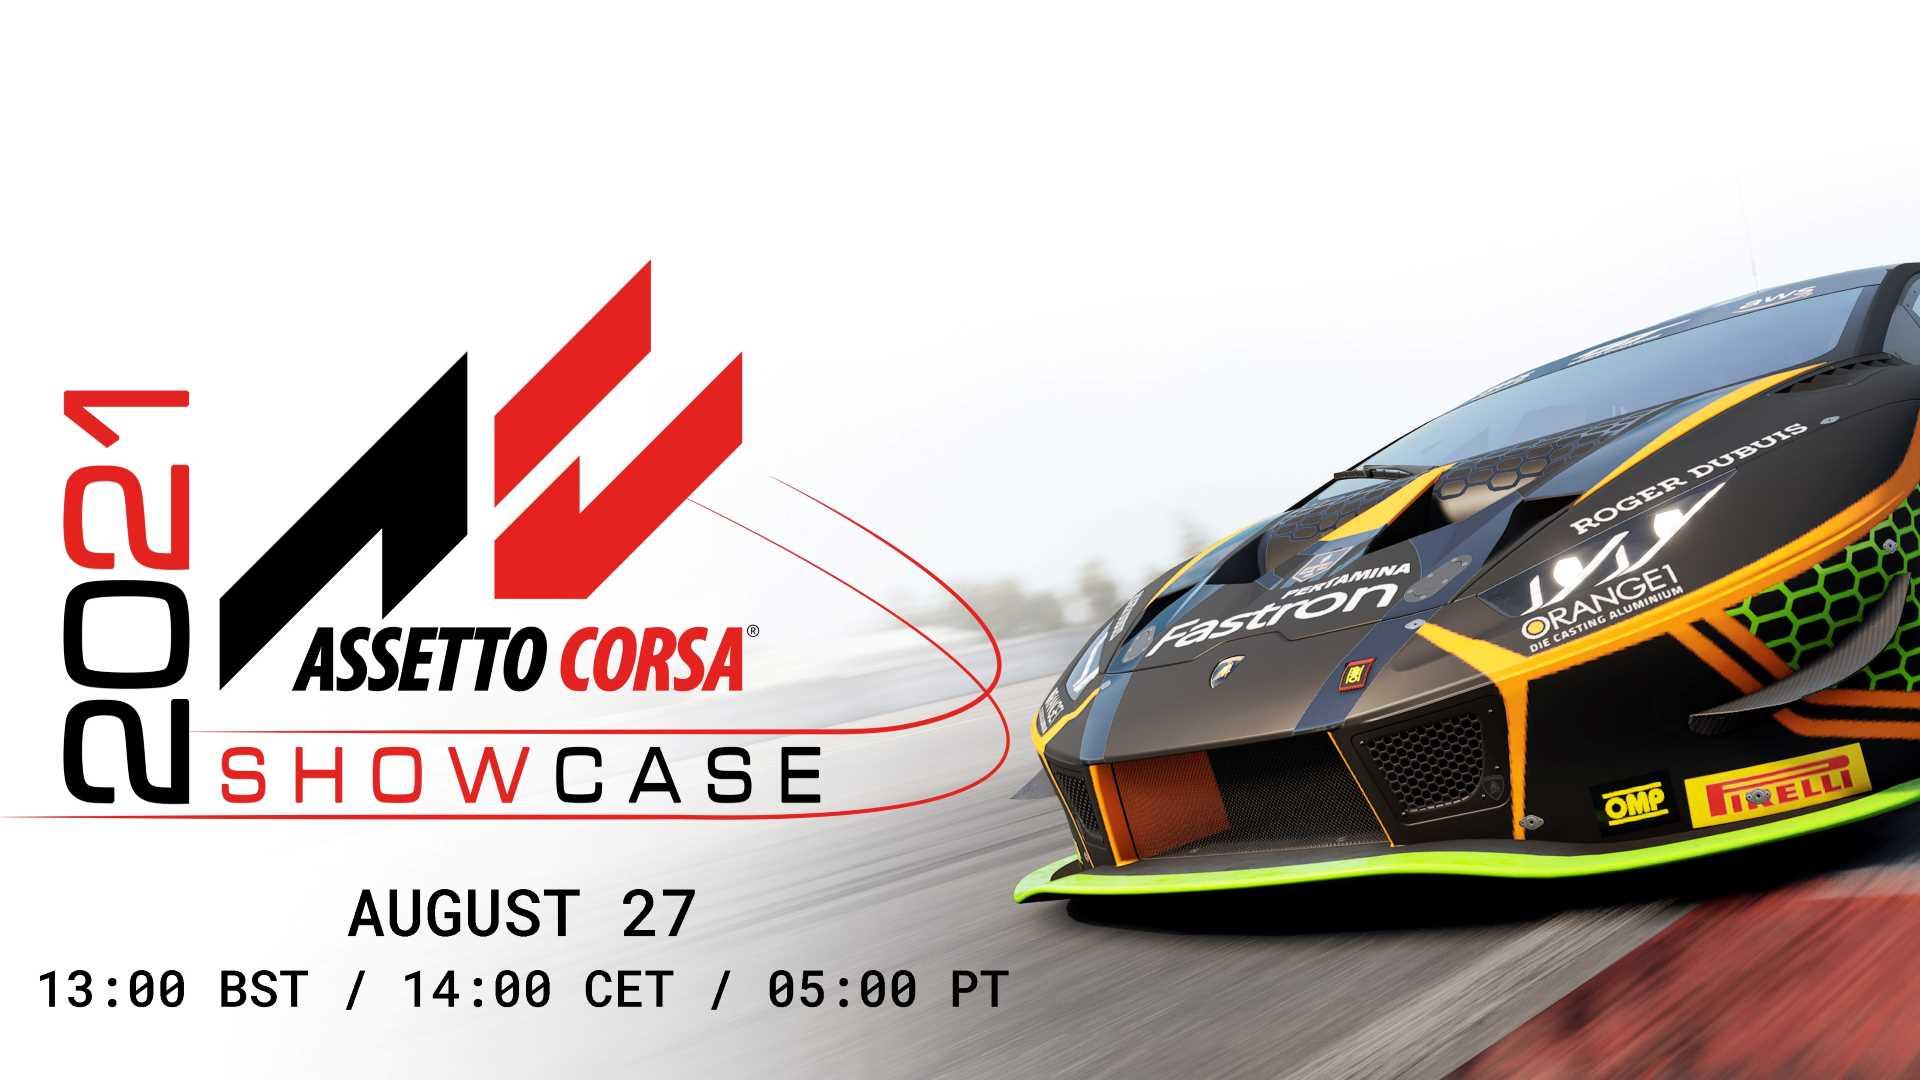 505 Games gamescom 2021 - Assetto Corsa Show Case